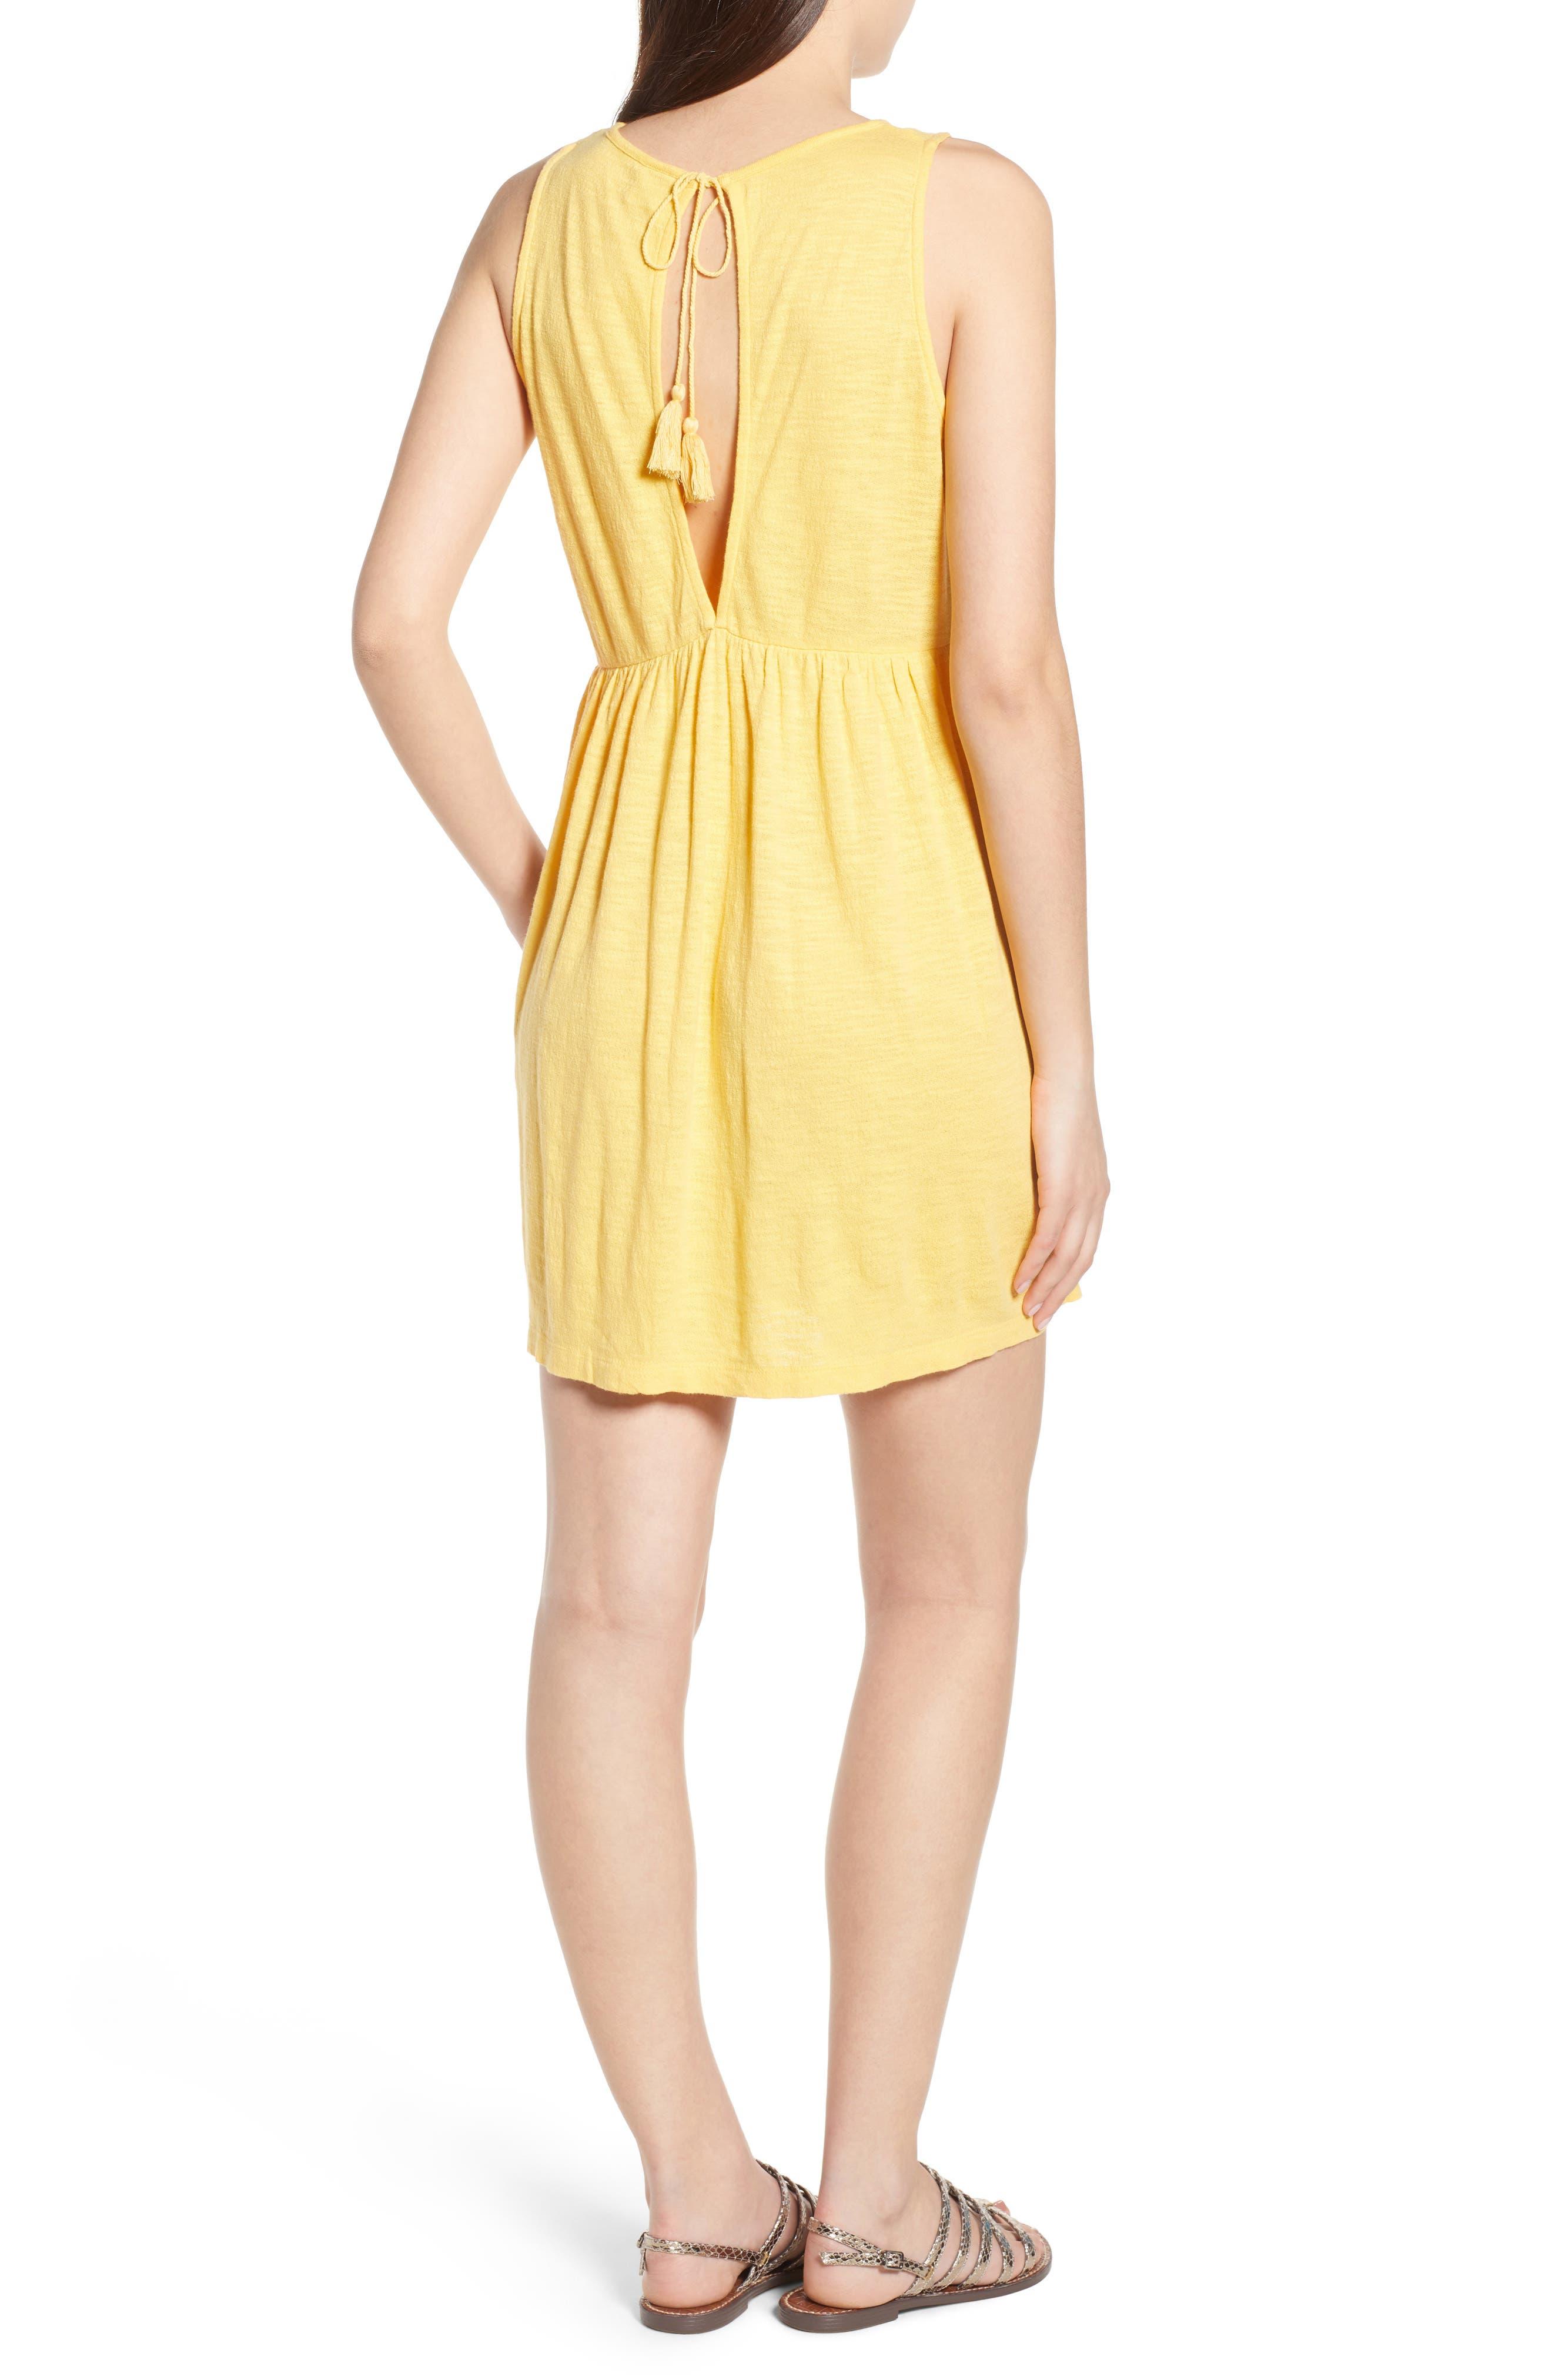 Tucson Cotton Dress,                             Alternate thumbnail 2, color,                             Buff Yellow